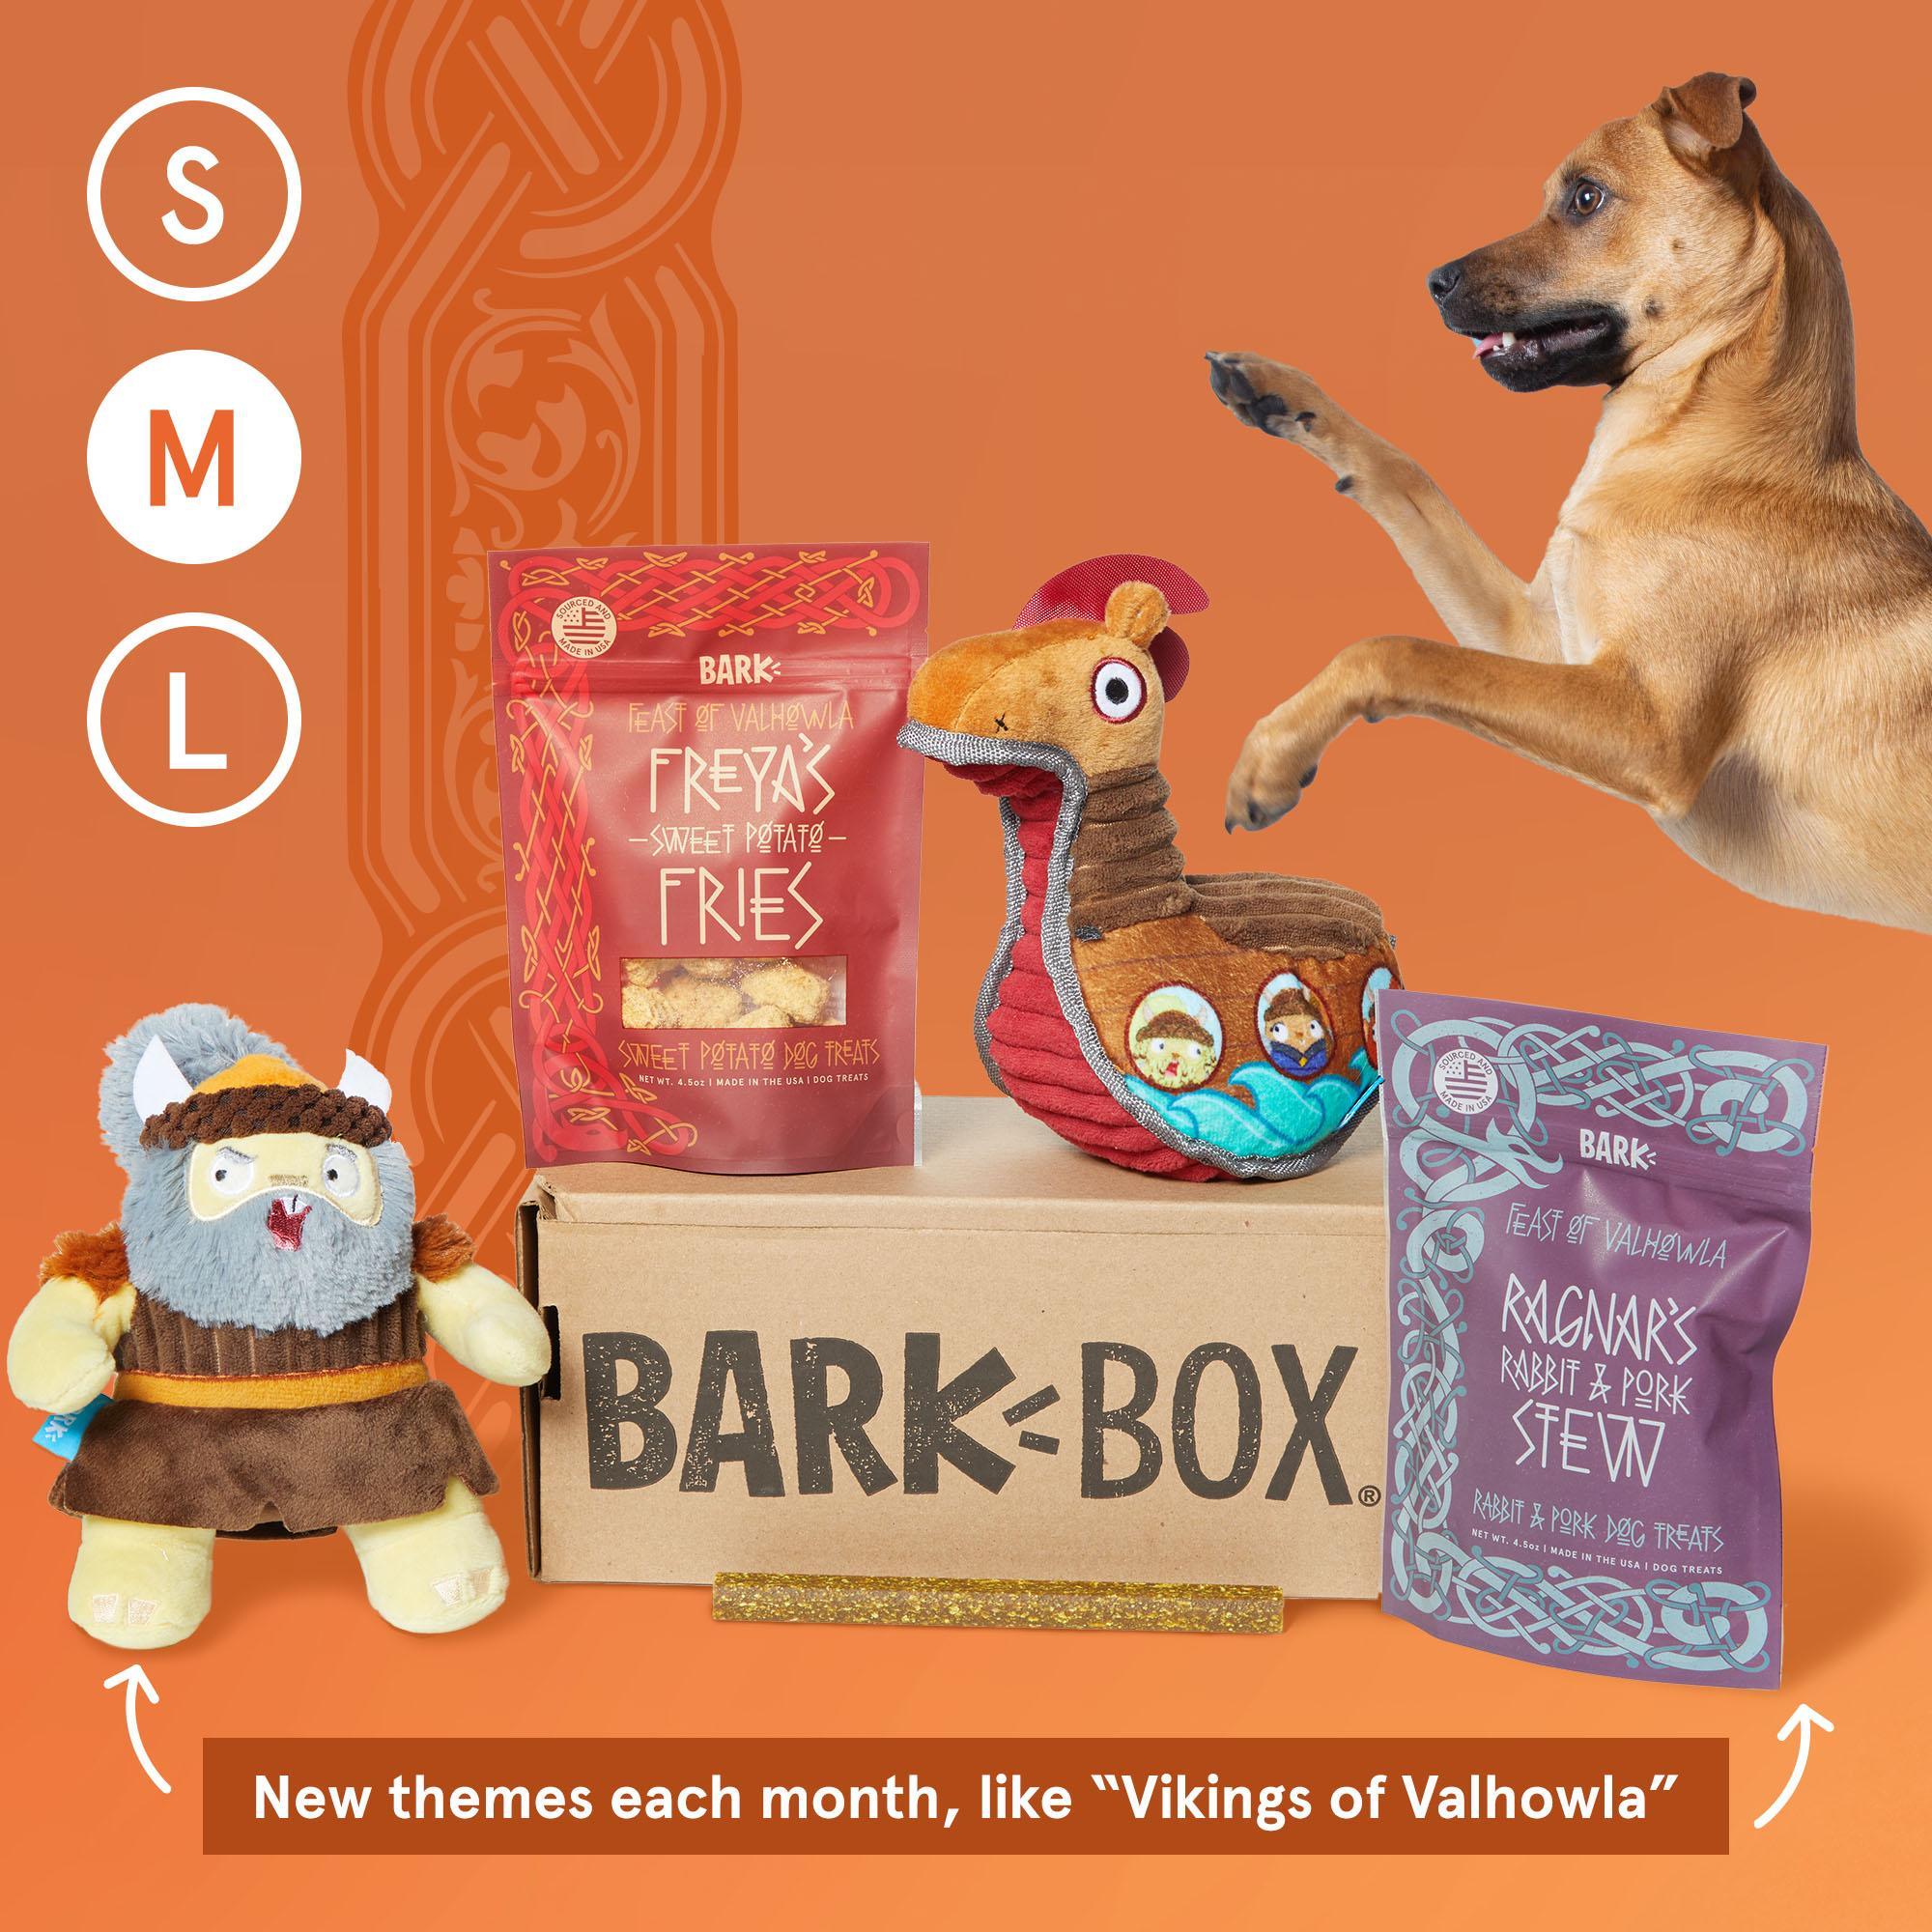 Dog games and treats